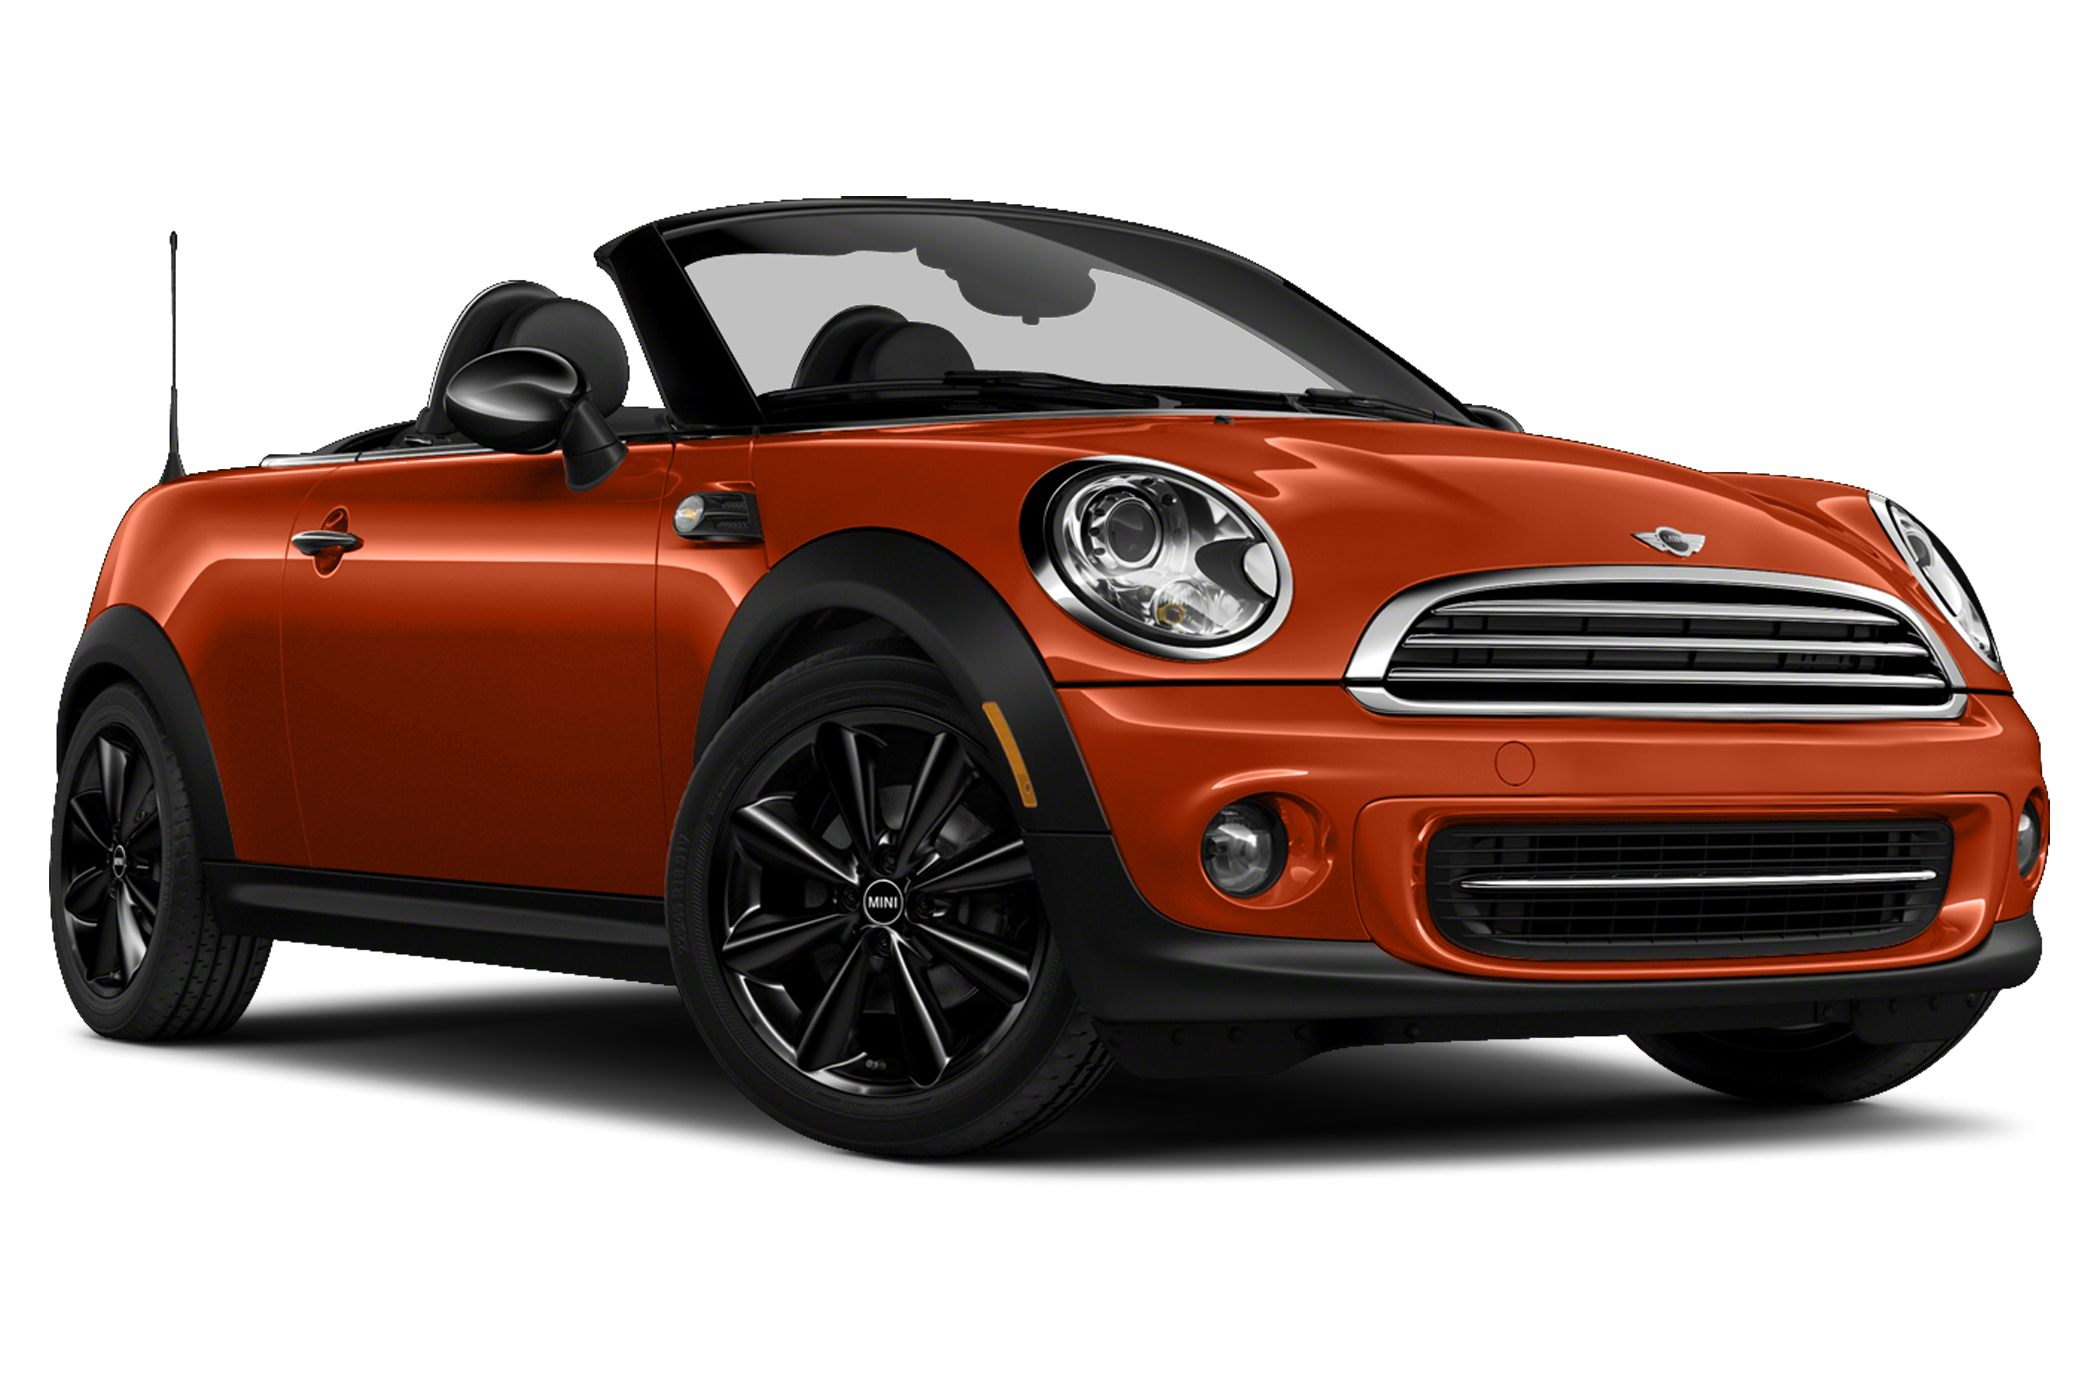 20 MINI Roadster Reviews, Specs, Photos